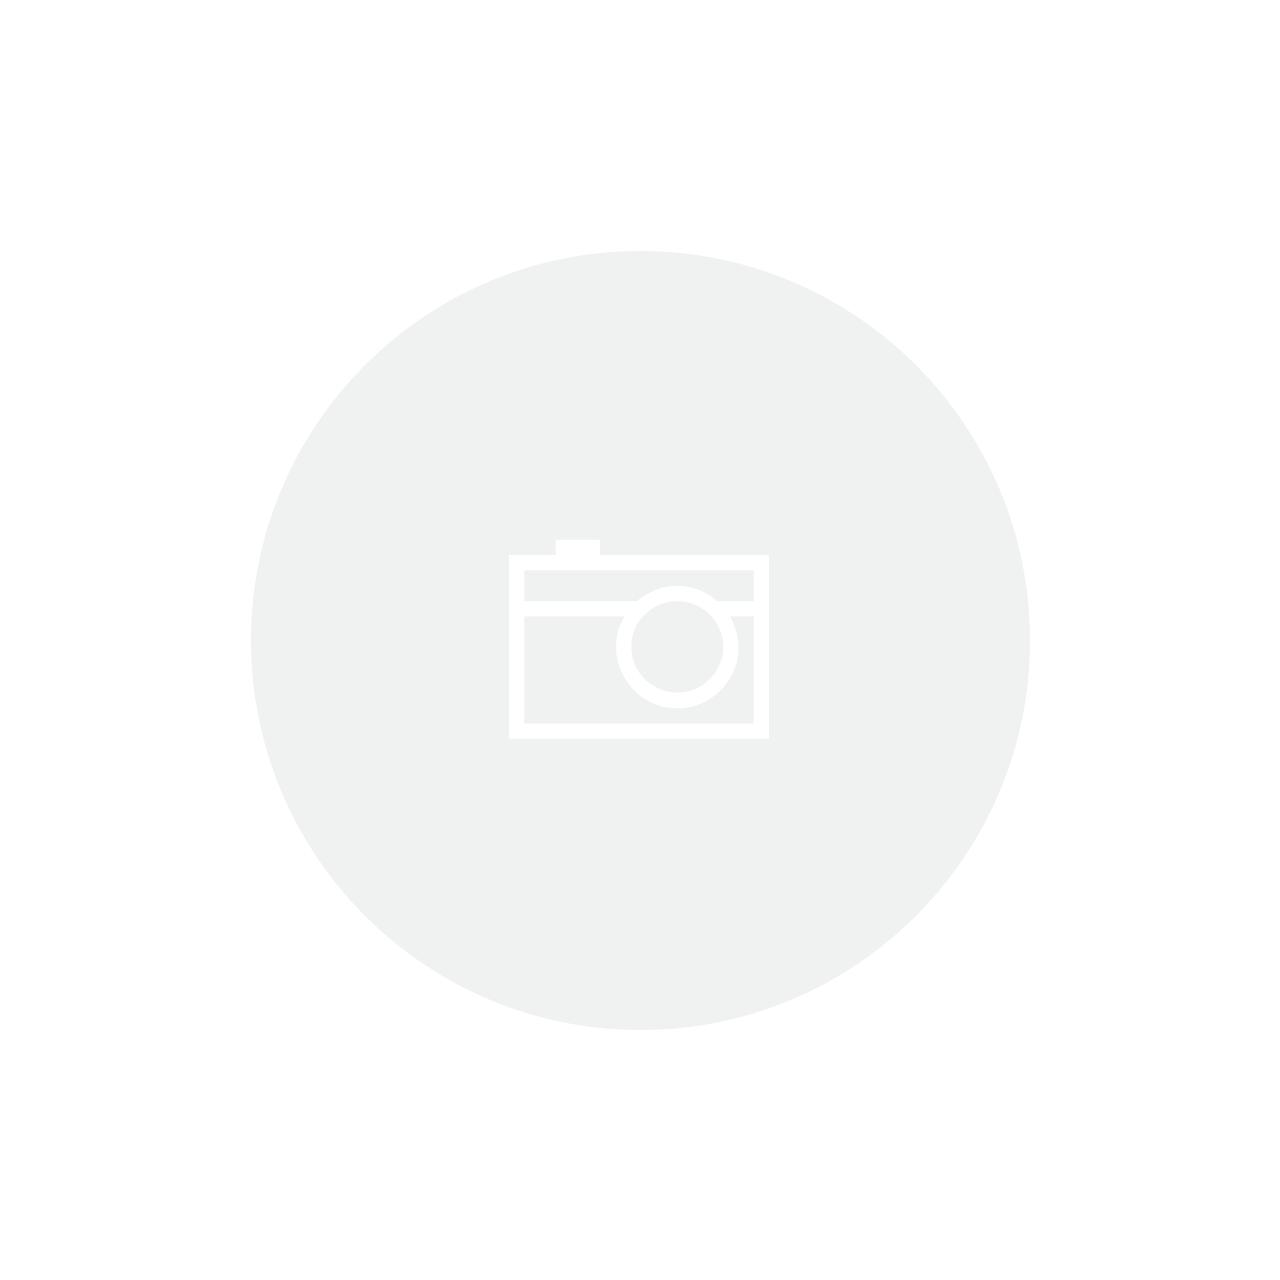 Placa de Video PNY Geforce GTX 1050Ti 4GB DDR5 128BIT - VCGGTX1050T4PB